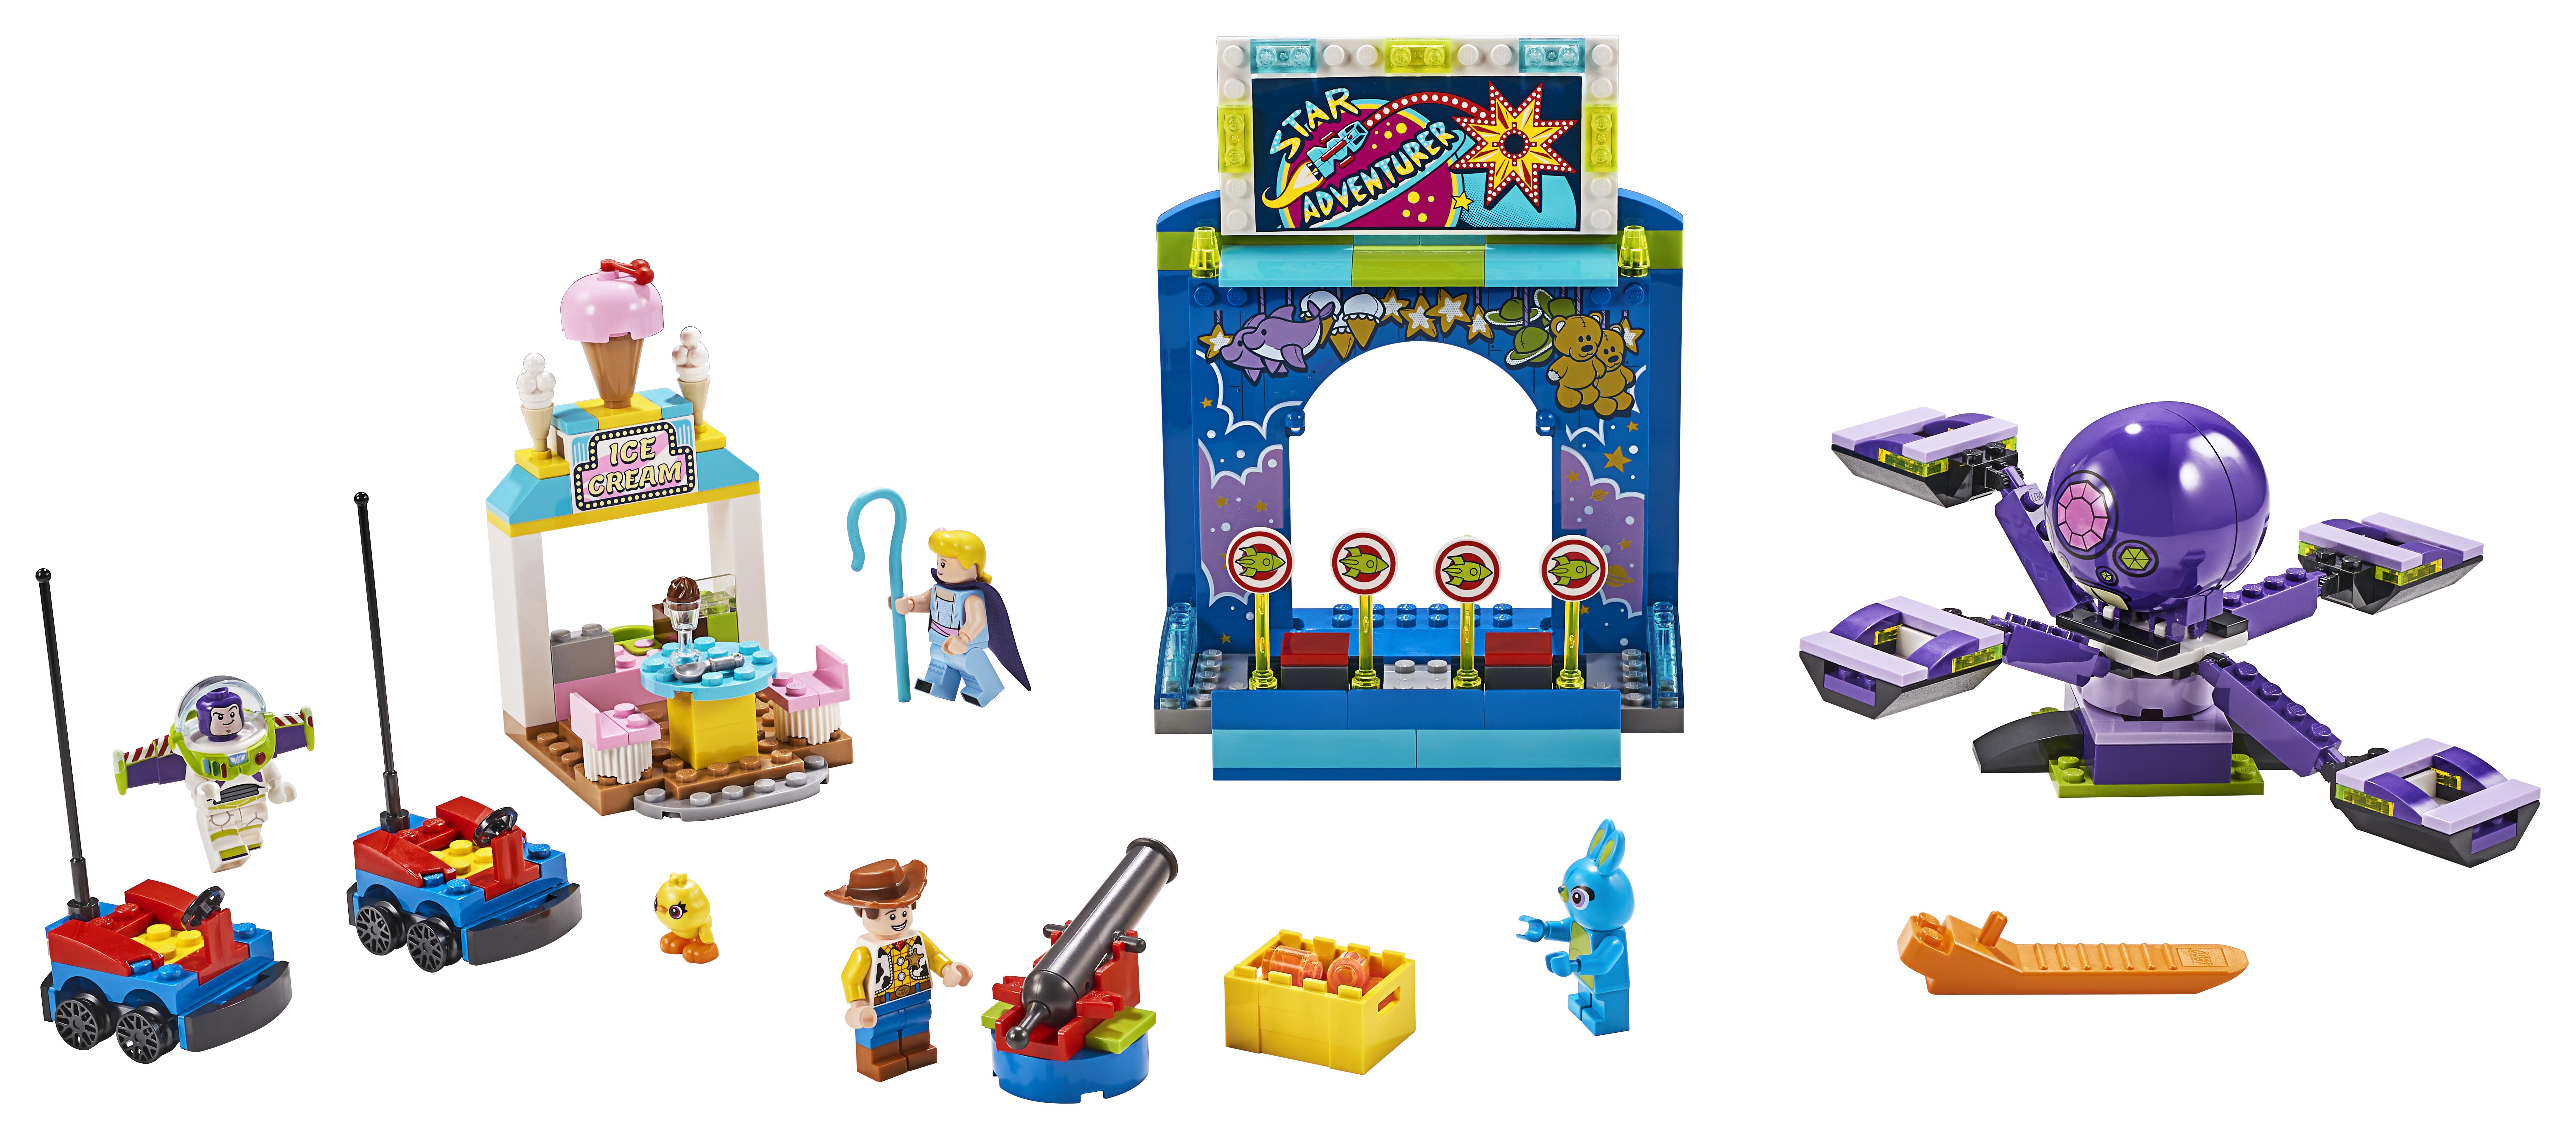 10770 – Buzz & Woody's Carnival Mania!